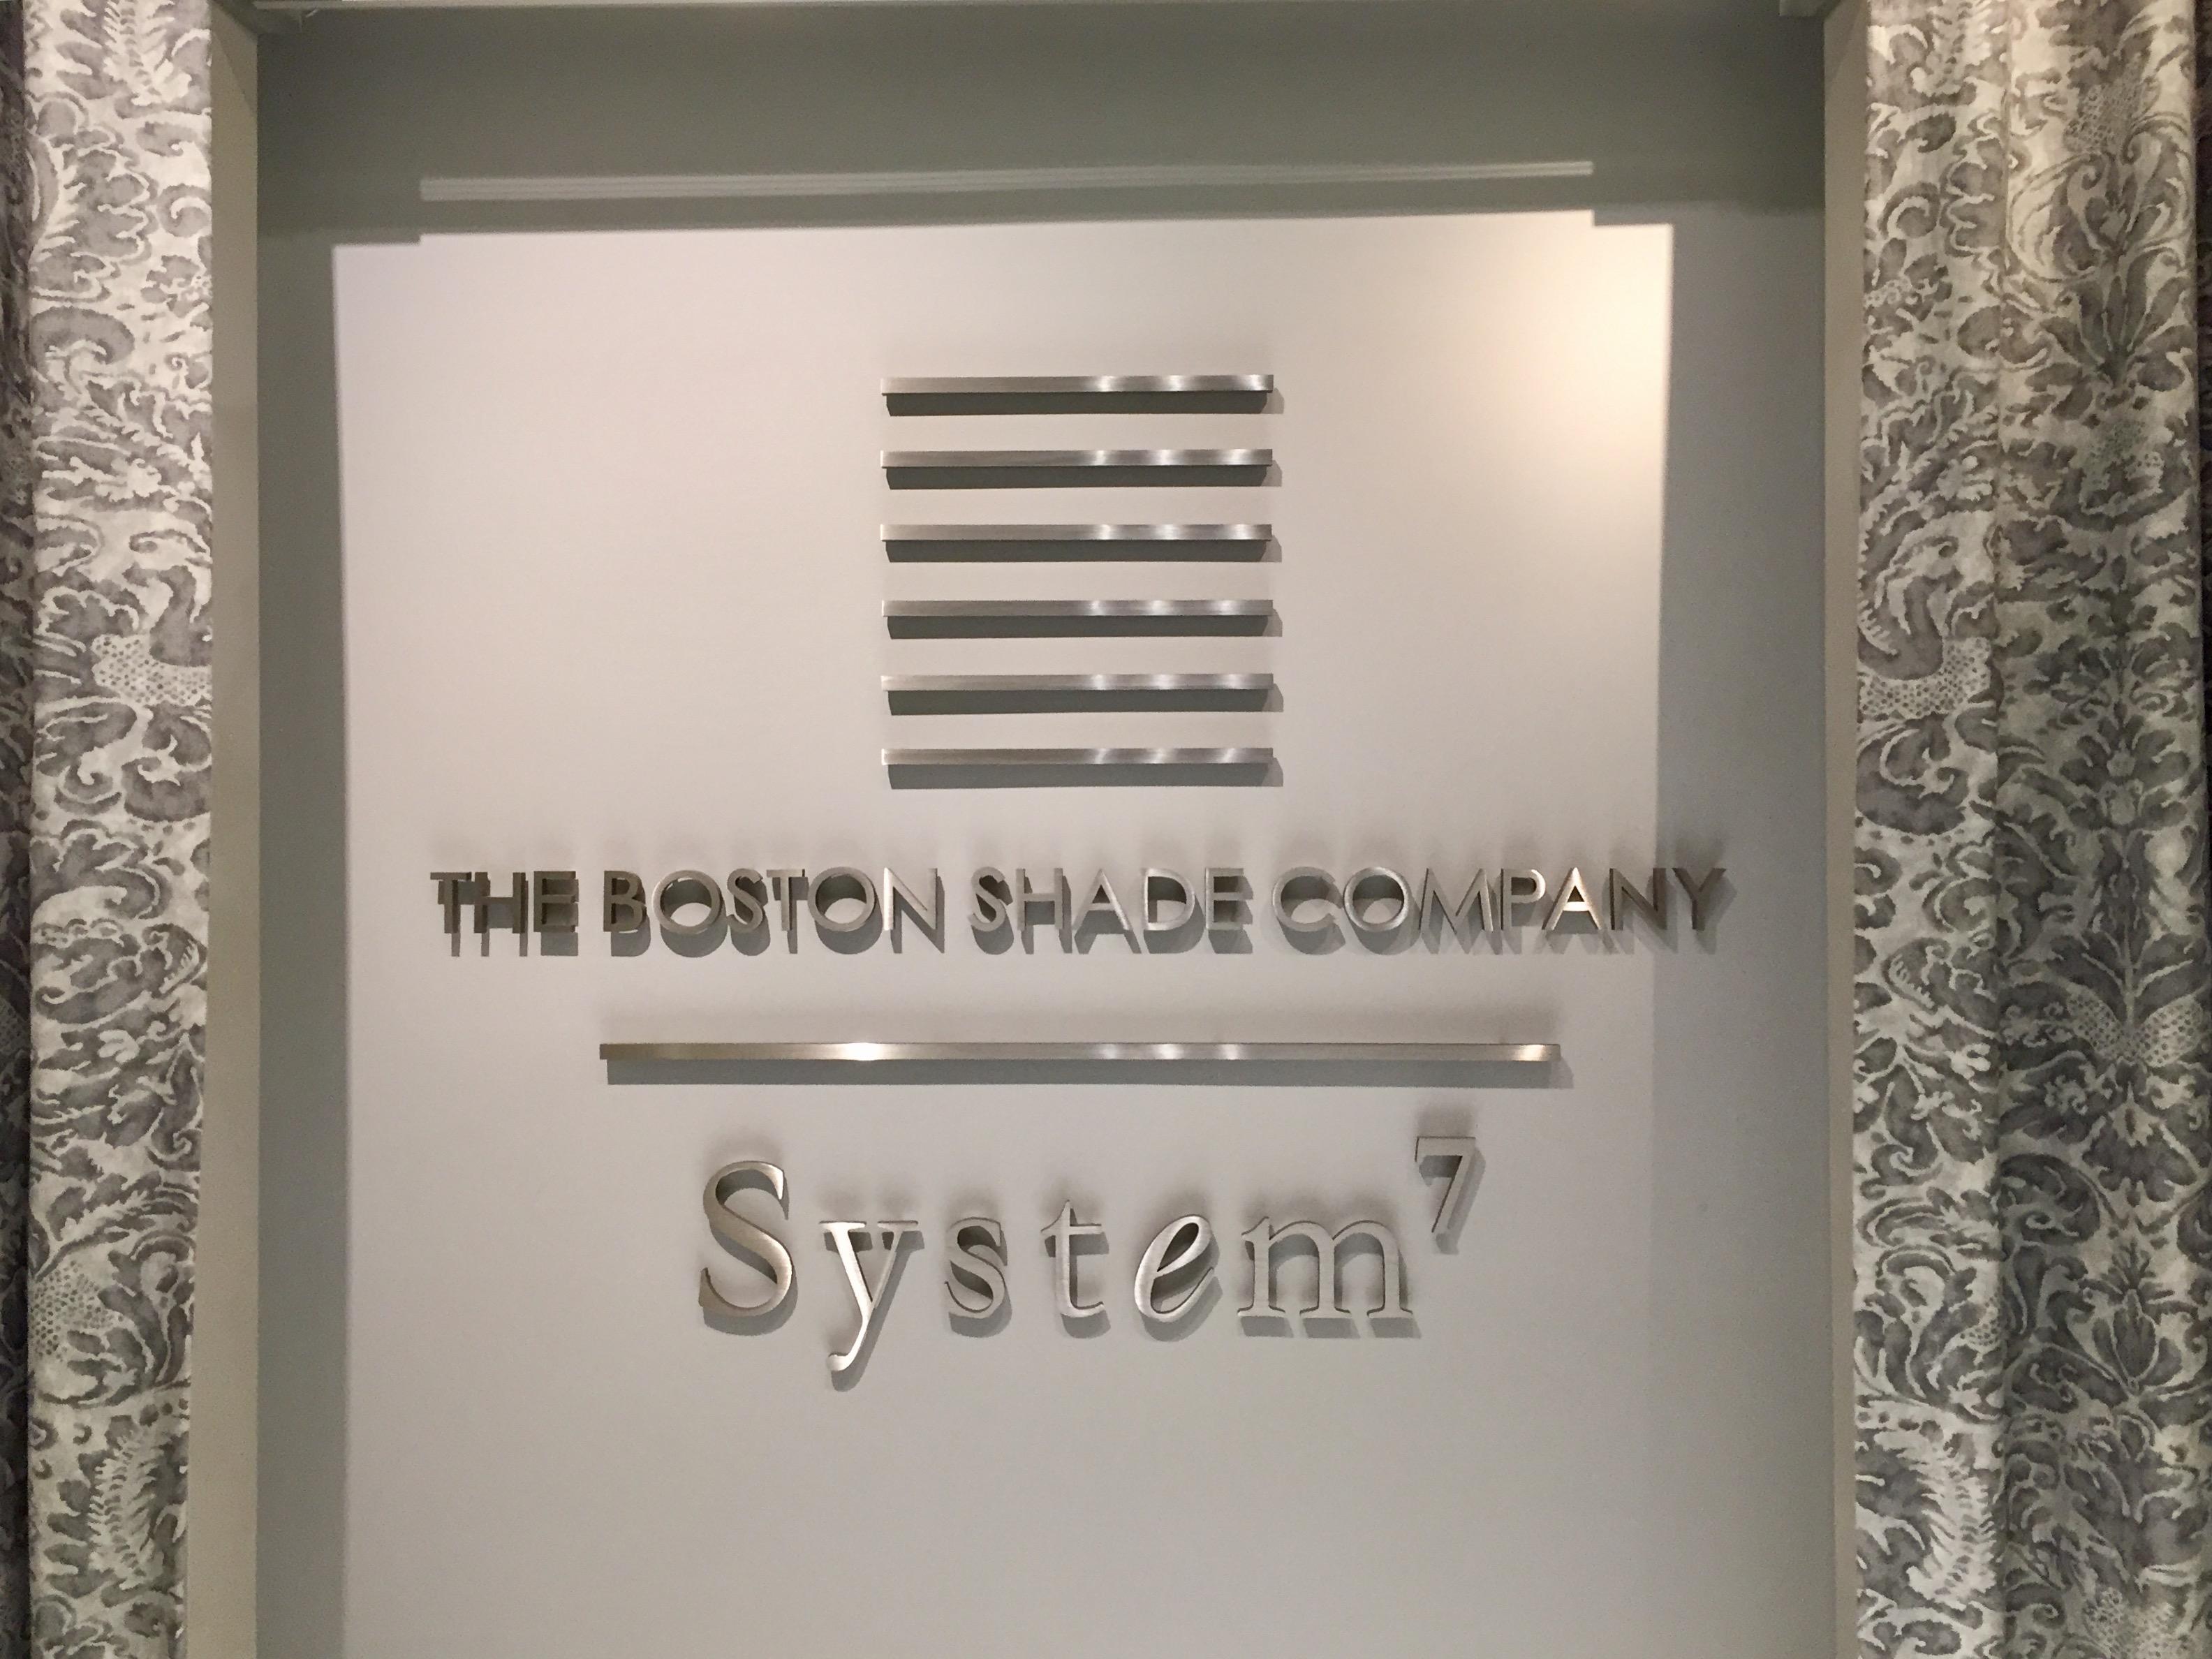 BSC Sign.jpg